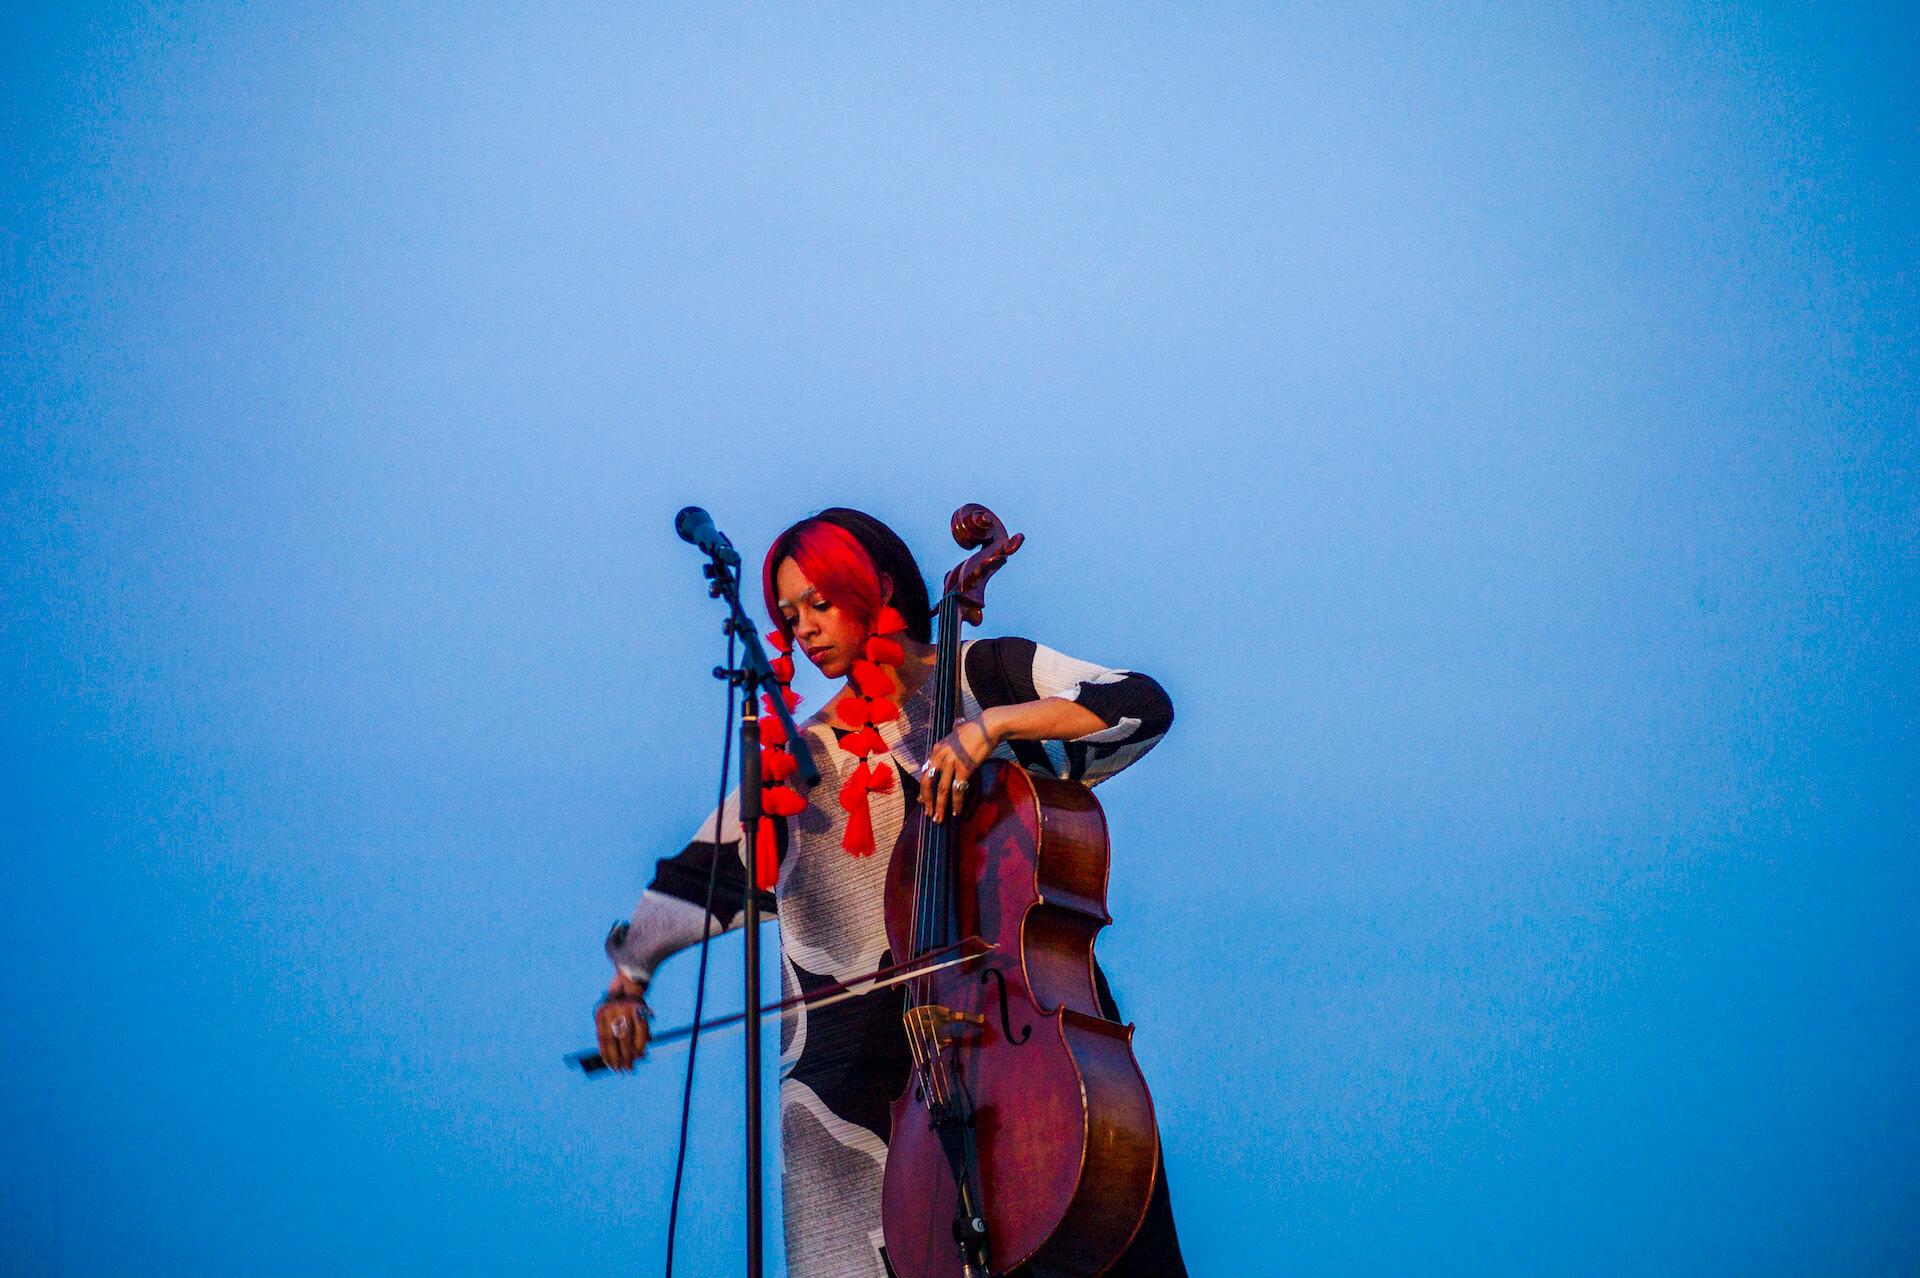 Kelsey Lu ライヴ・レポート 小田原文化財団/江之浦測候所で日没に向かうたった50分の間に見せた奇跡 music190529-kelsey-lu-report-3